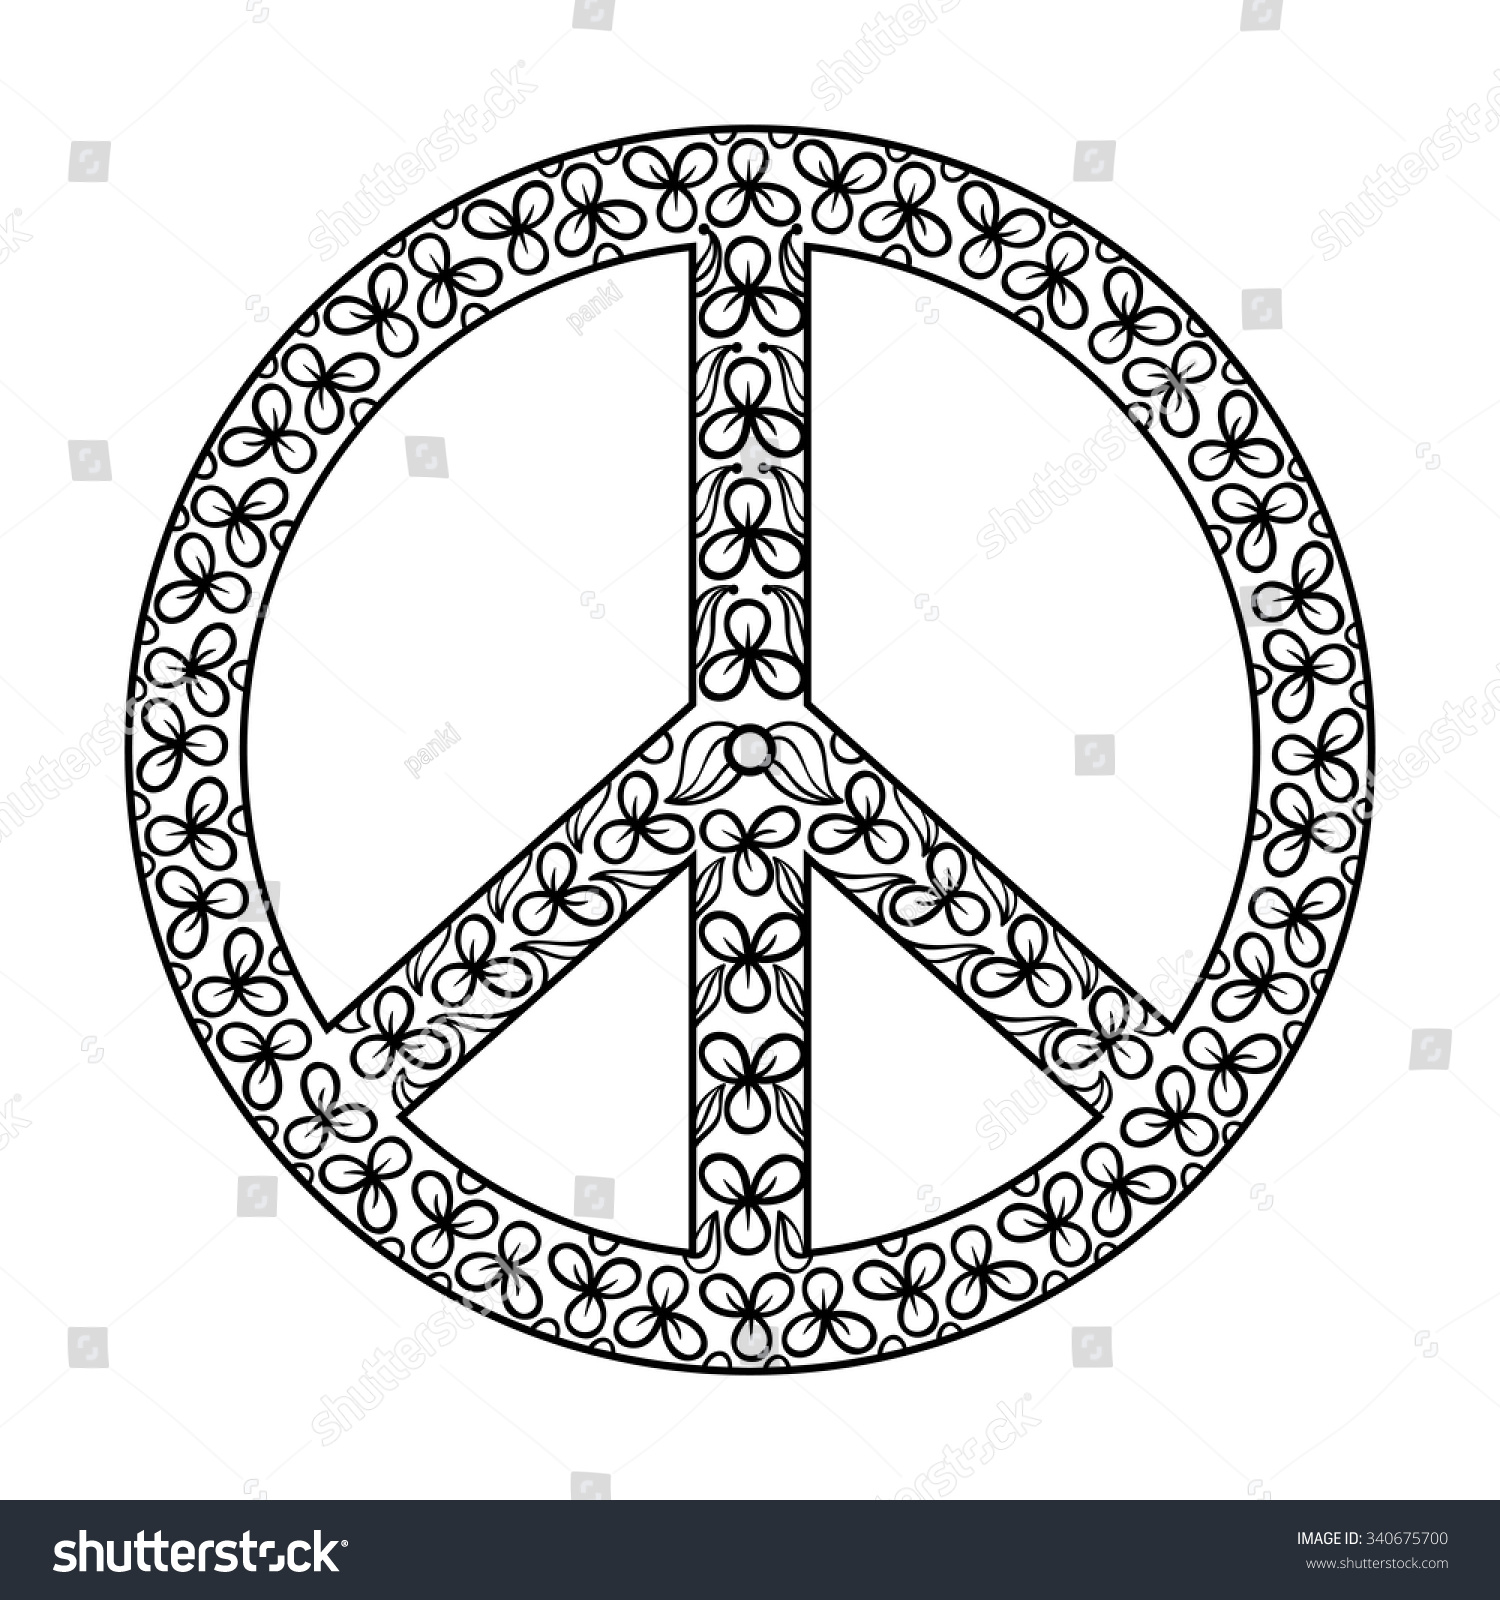 zentangle black peace symbol tattoo design stock vector 340675700